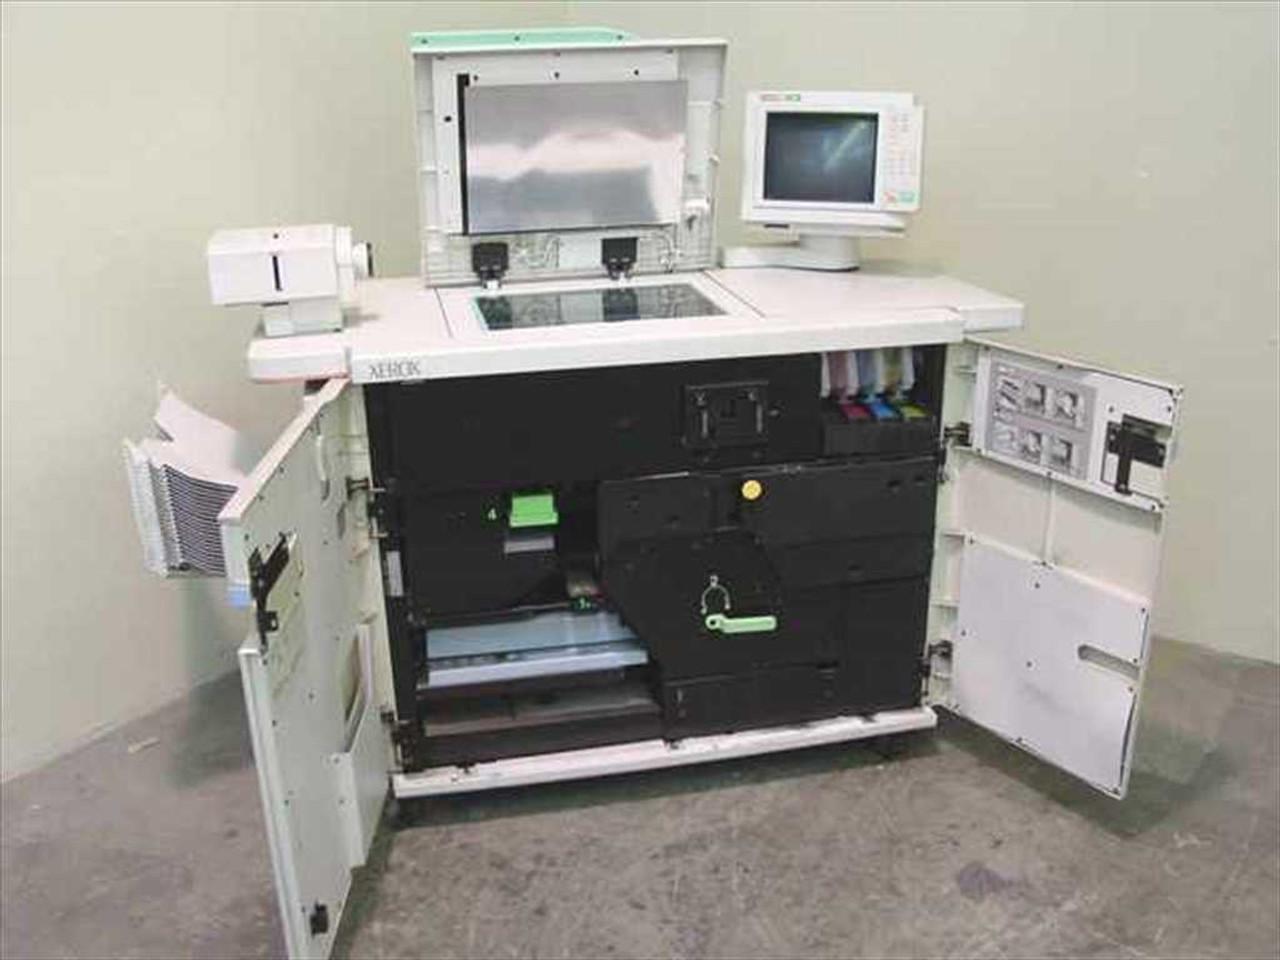 Xerox 5775 SSE Digital Color Copier-Printer w/Error Code 6270